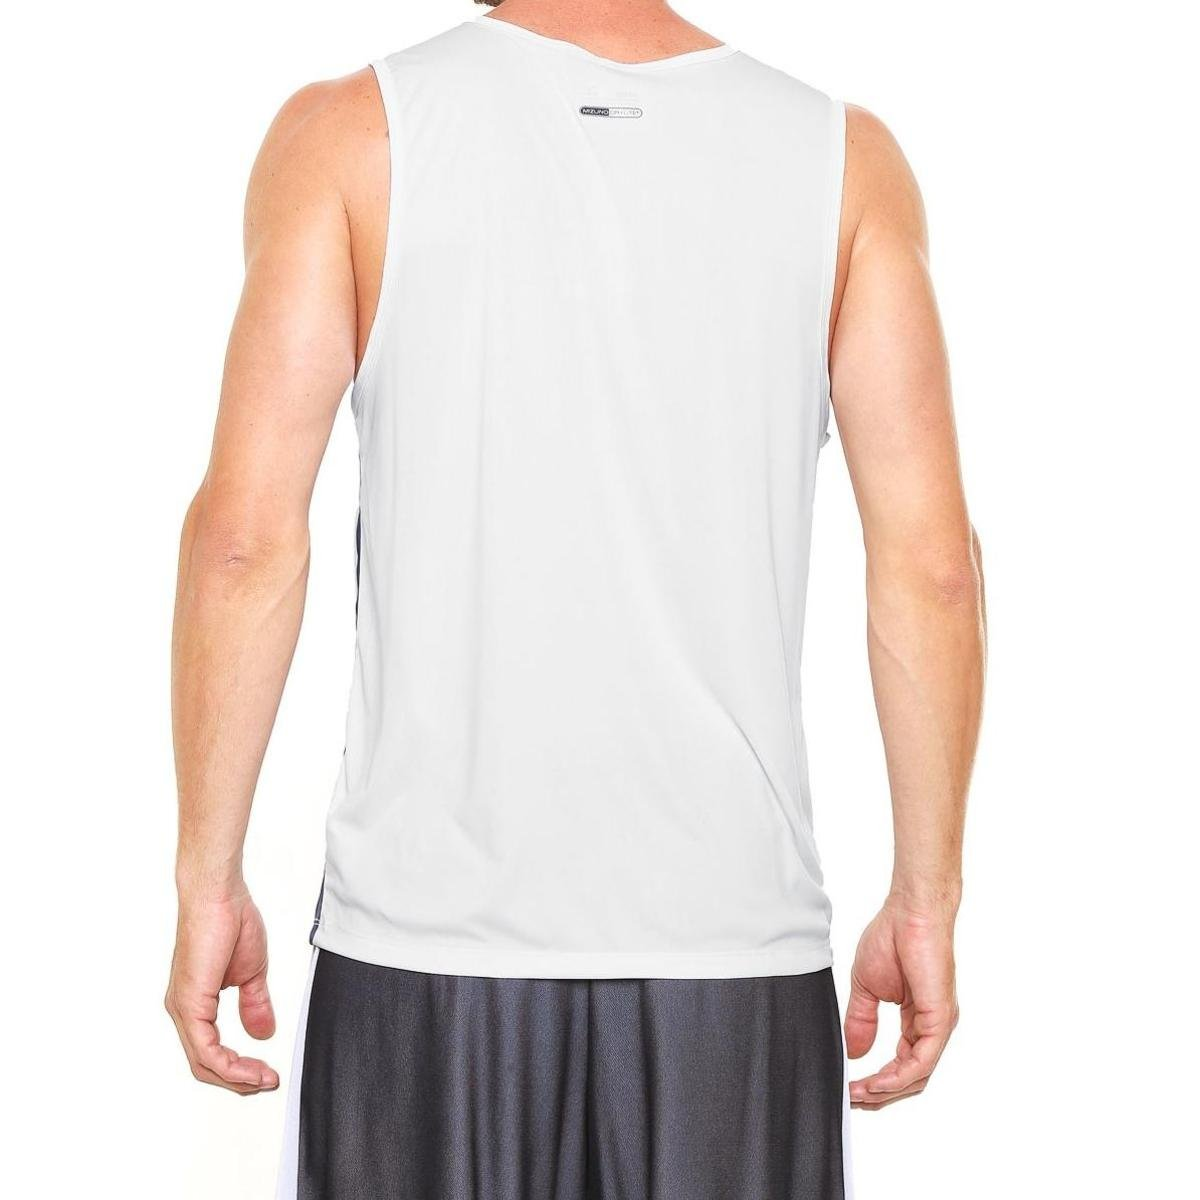 80e2bc347b Camiseta Regata Mizuno Wave Run 2 Masculina - Branco e Azul - Compre ...